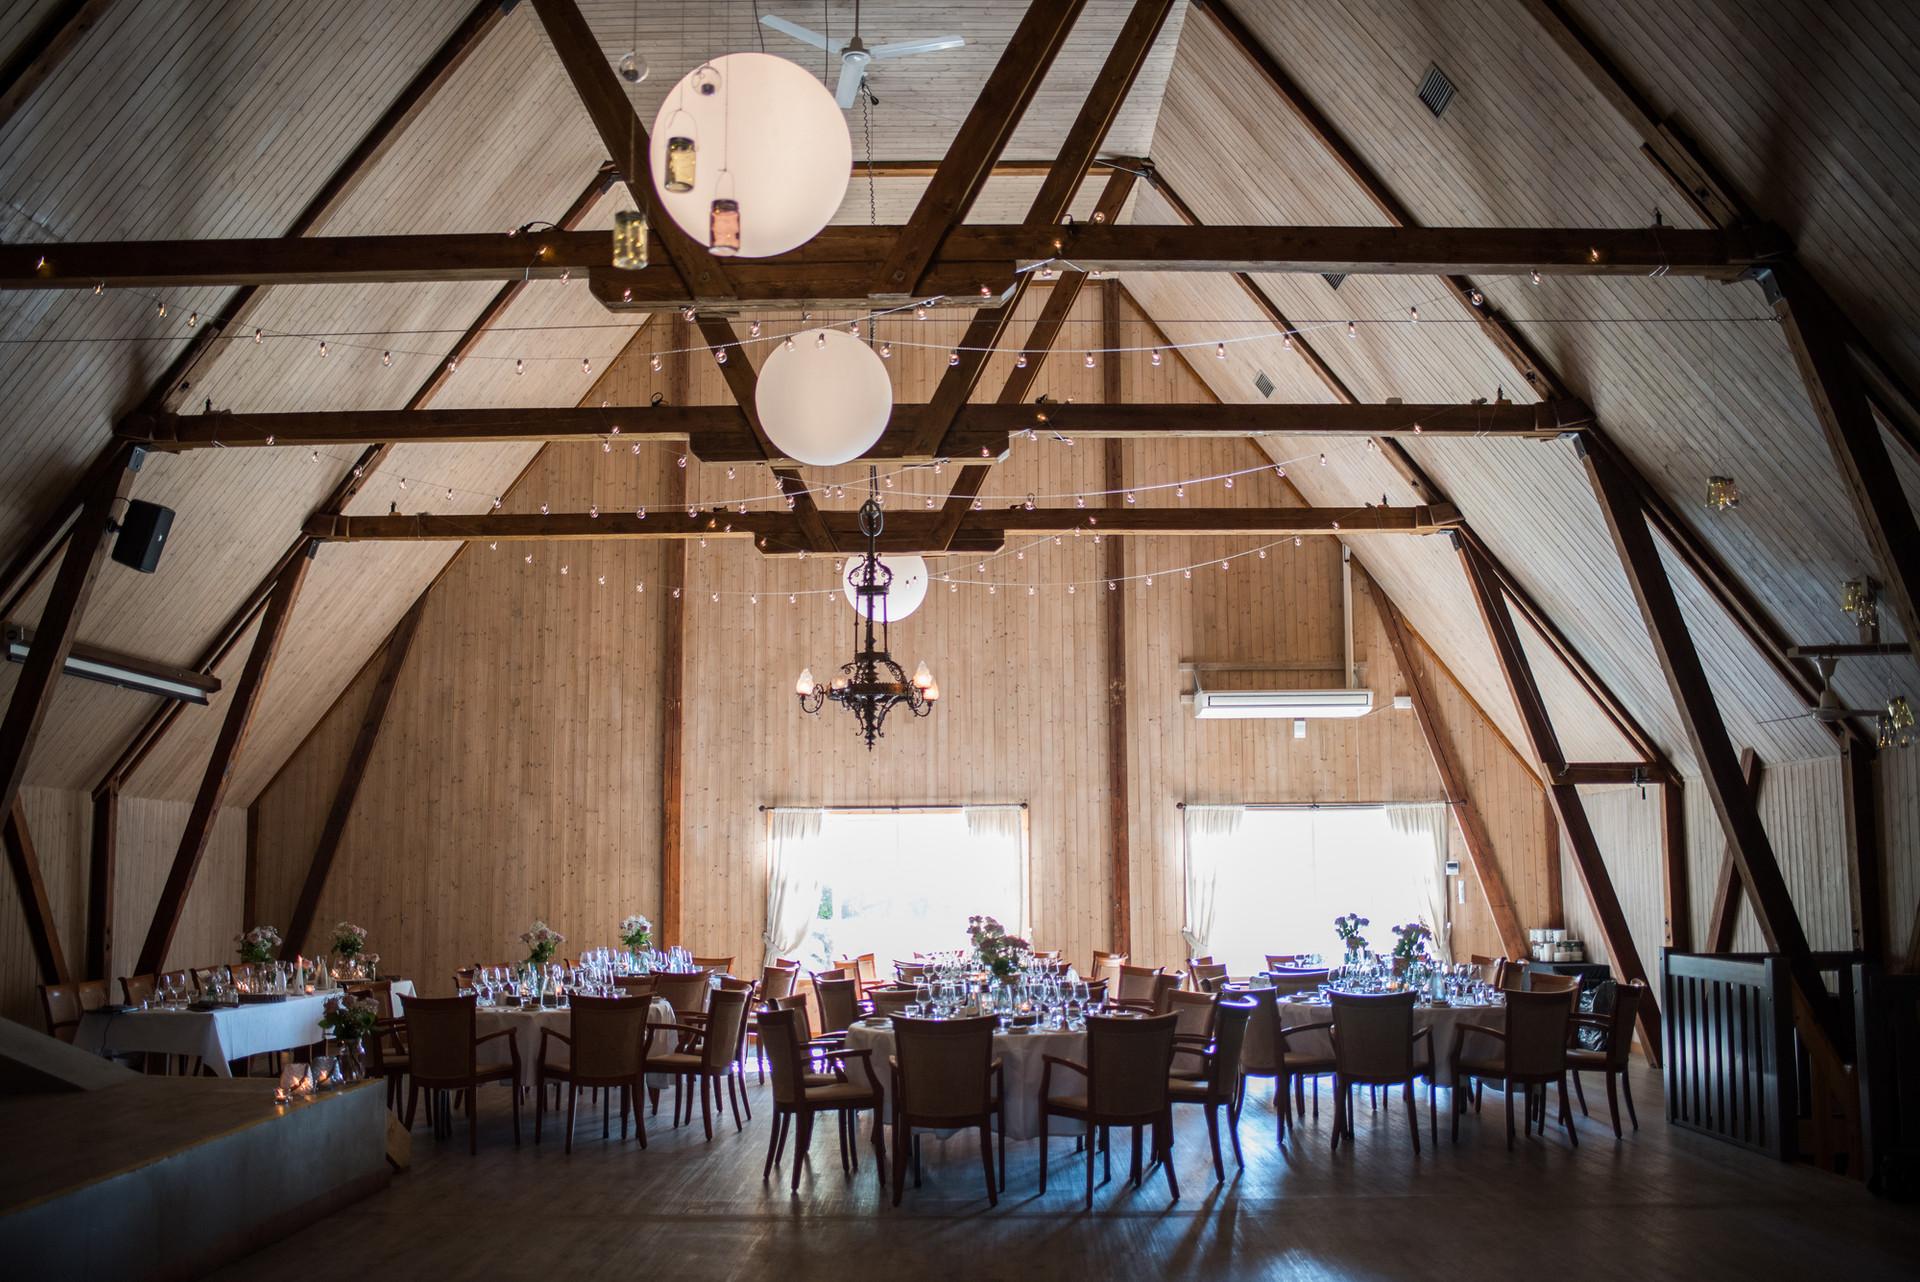 Høyt under taket i festsalen, foto: privat